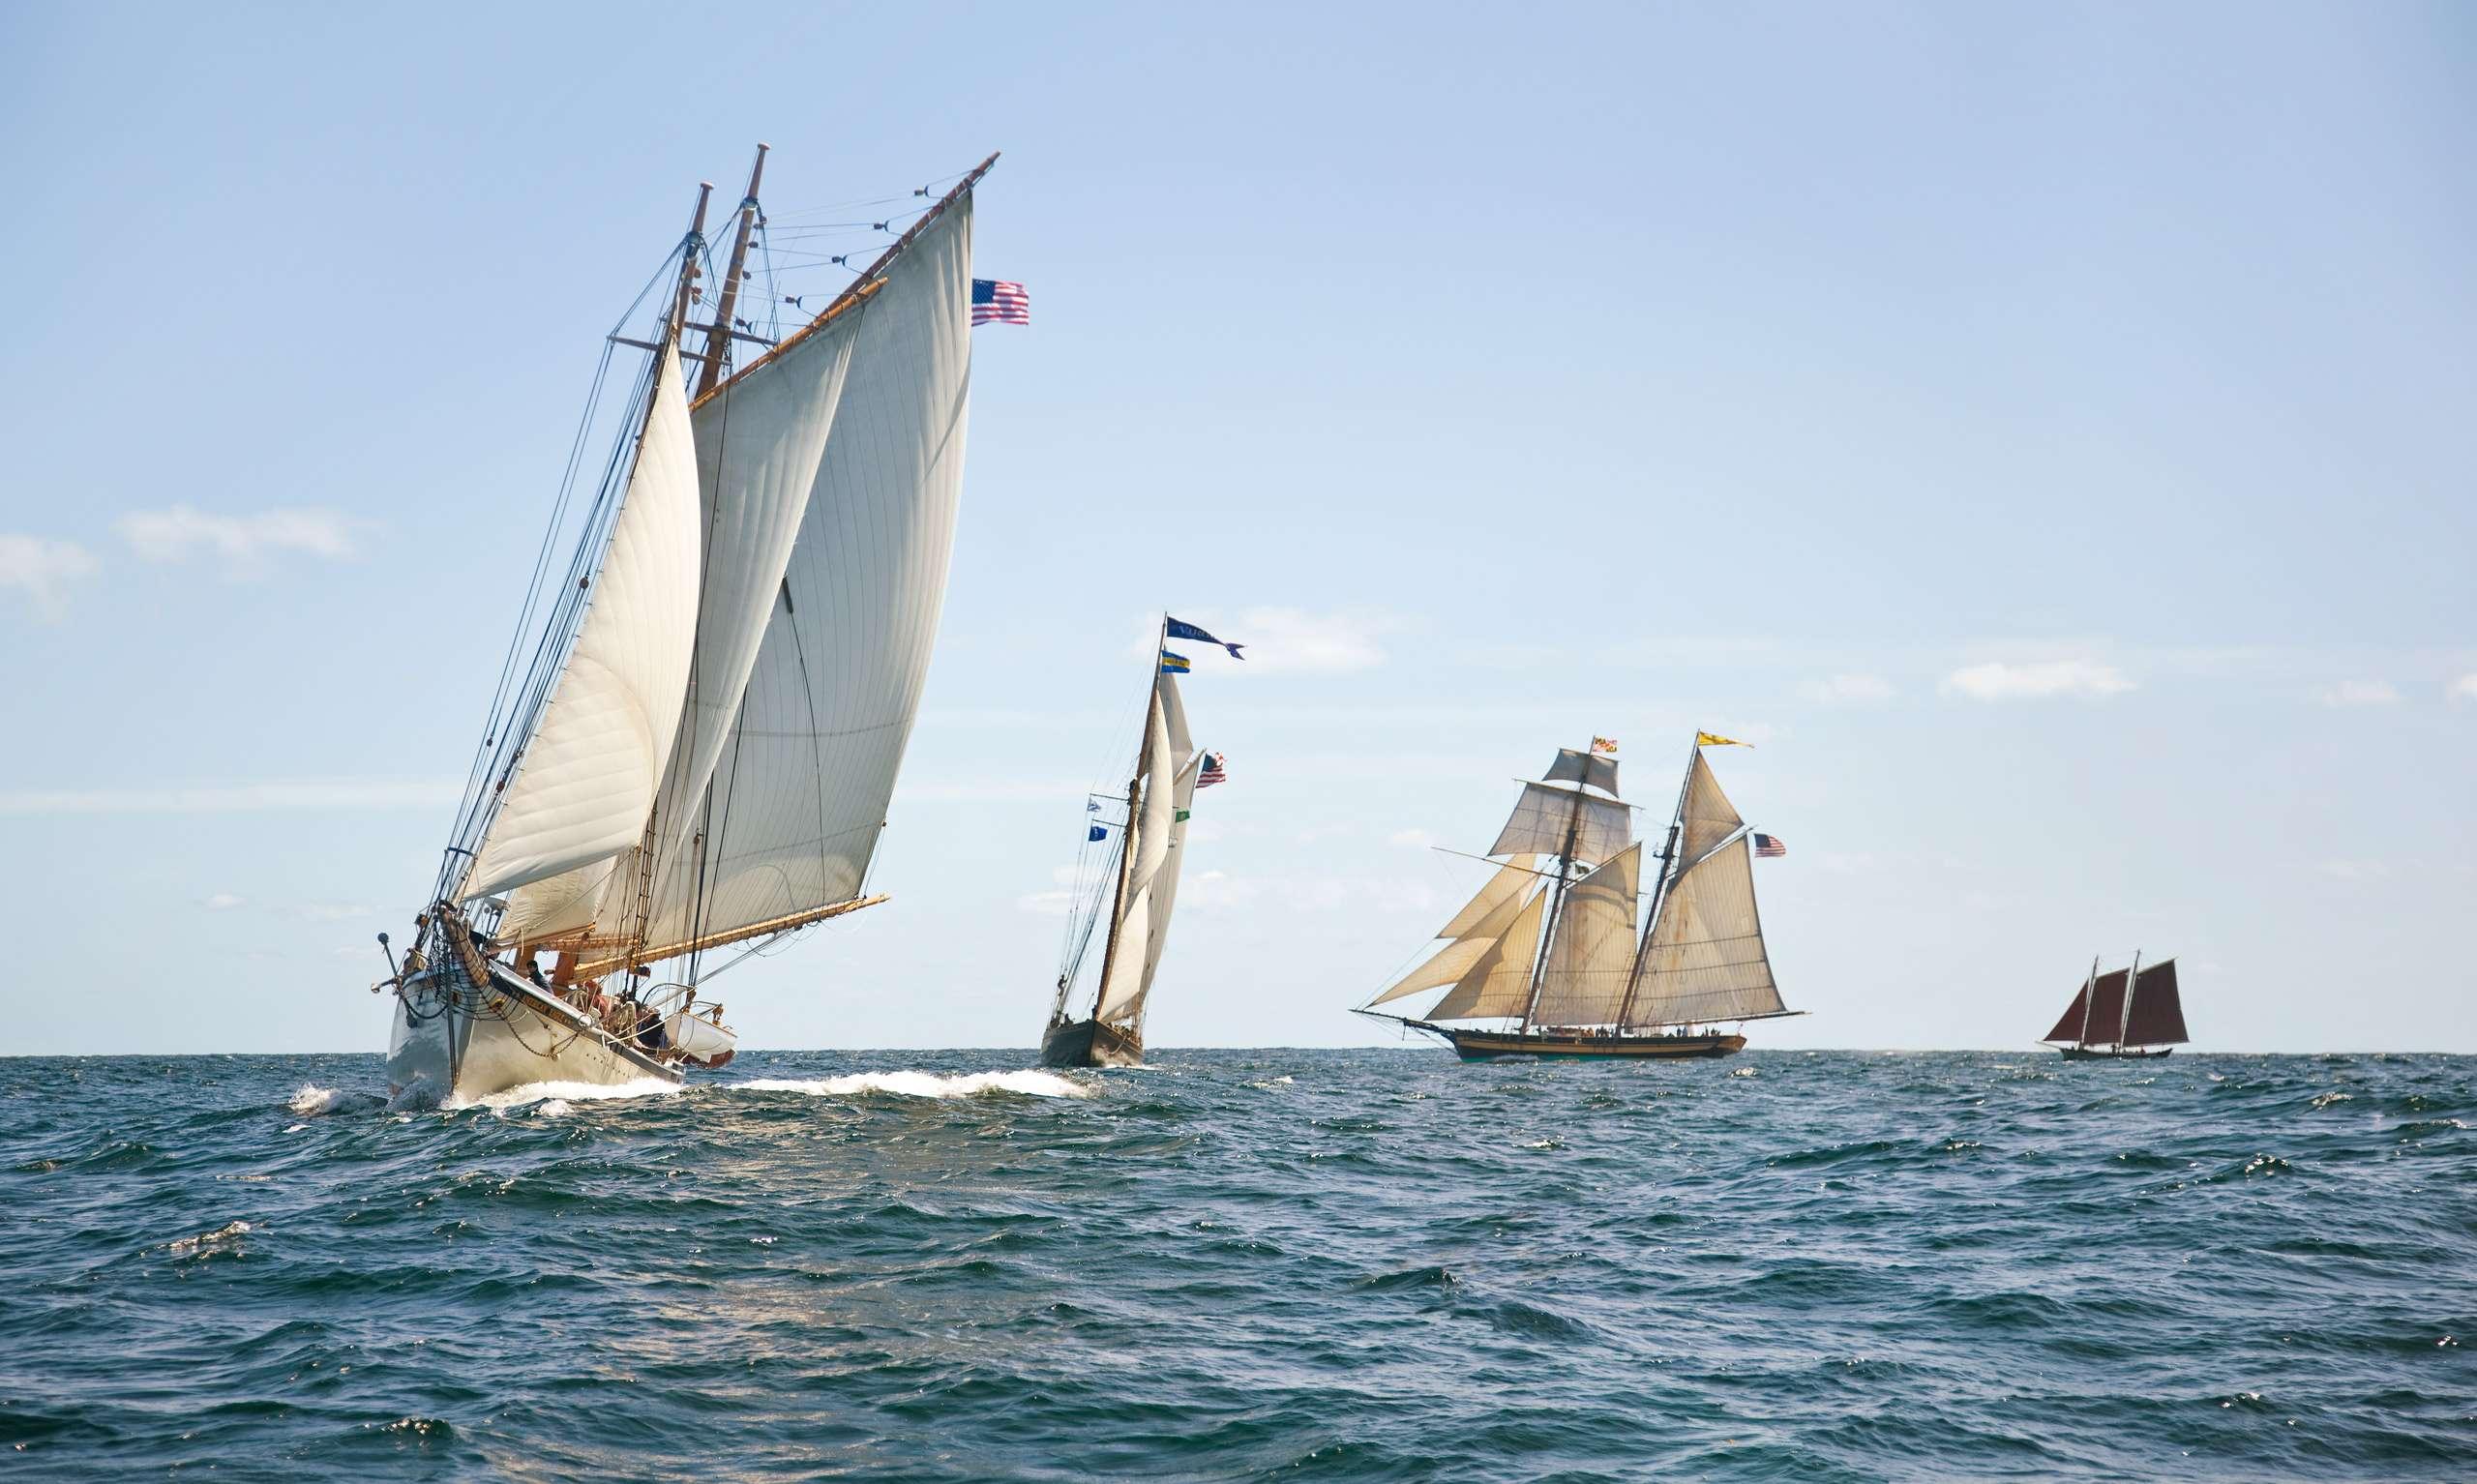 PORTFOLIO - Sailing - Windjammers #15   PCG451